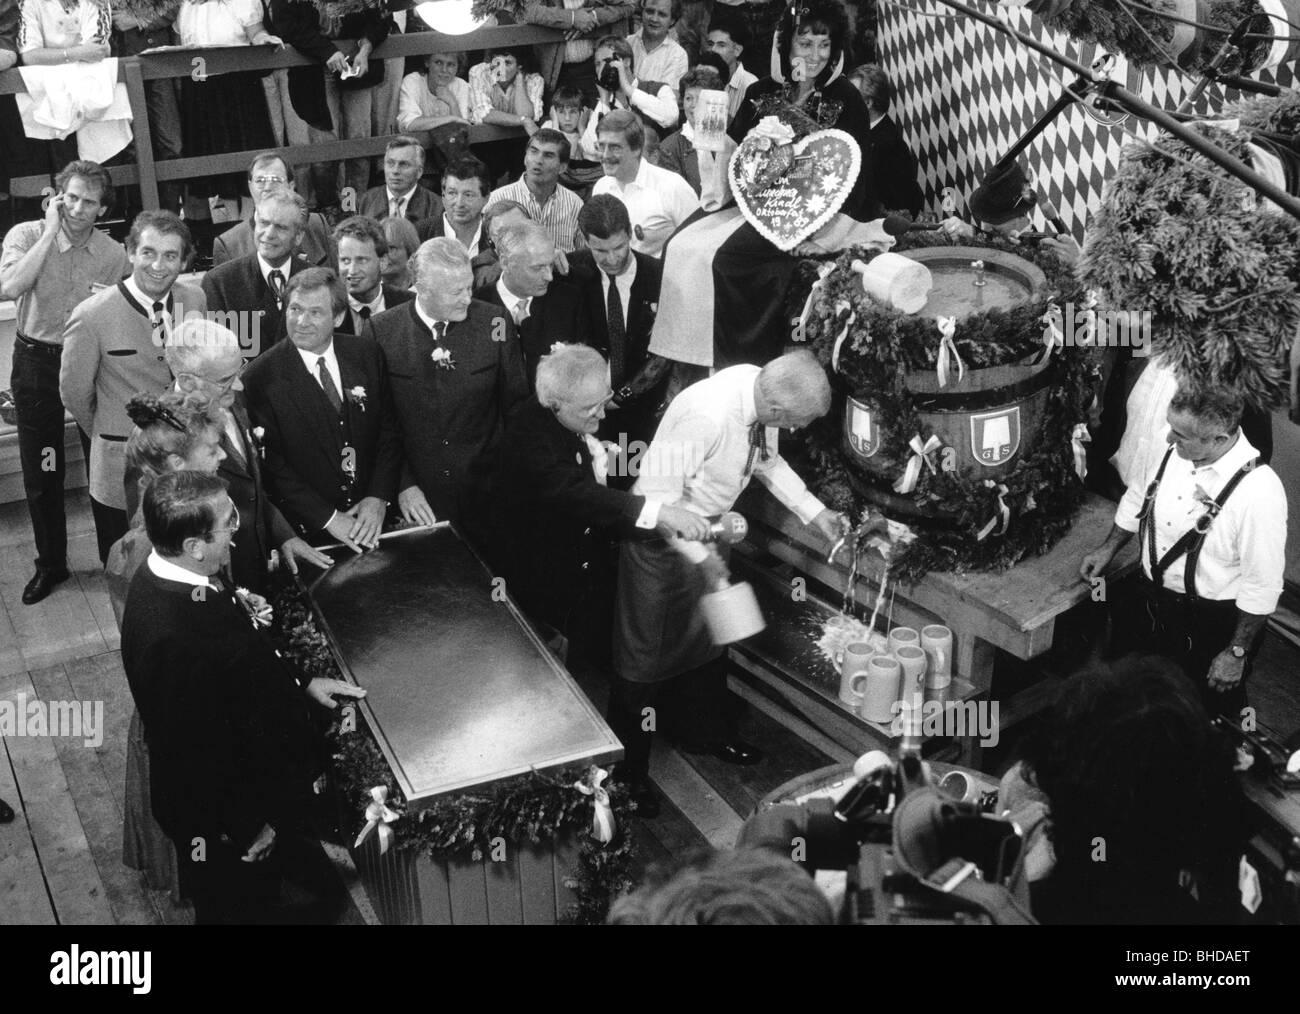 Kronawitter, Georg 21.4.1928 - 28.4.2016, German politician (SPD), scene, Oktoberfest, keg tapping, 1989, with Max - Stock Image